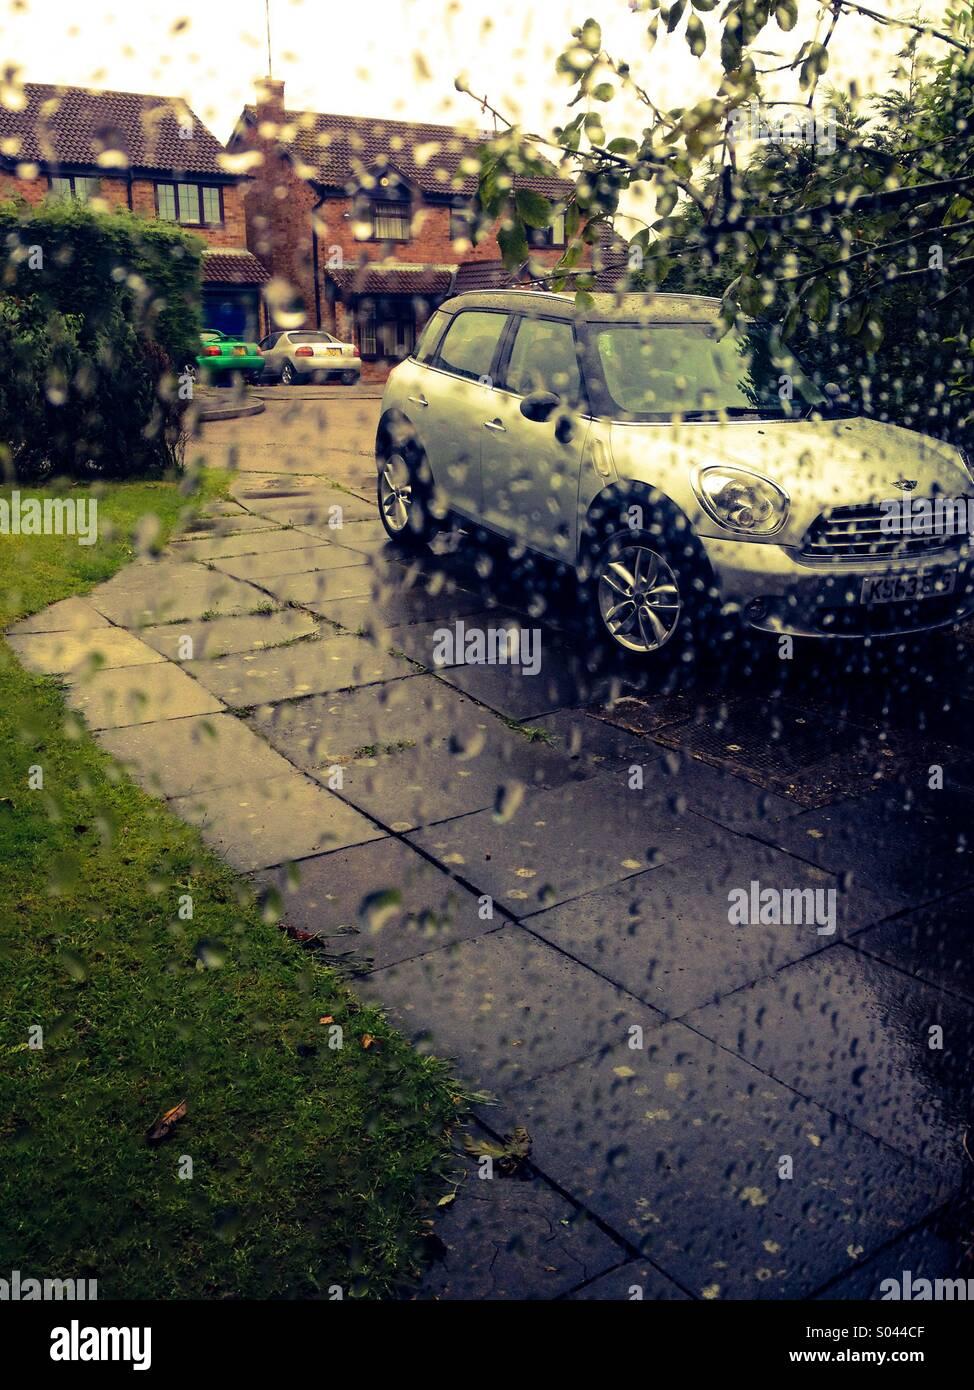 Wet drive way - Stock Image